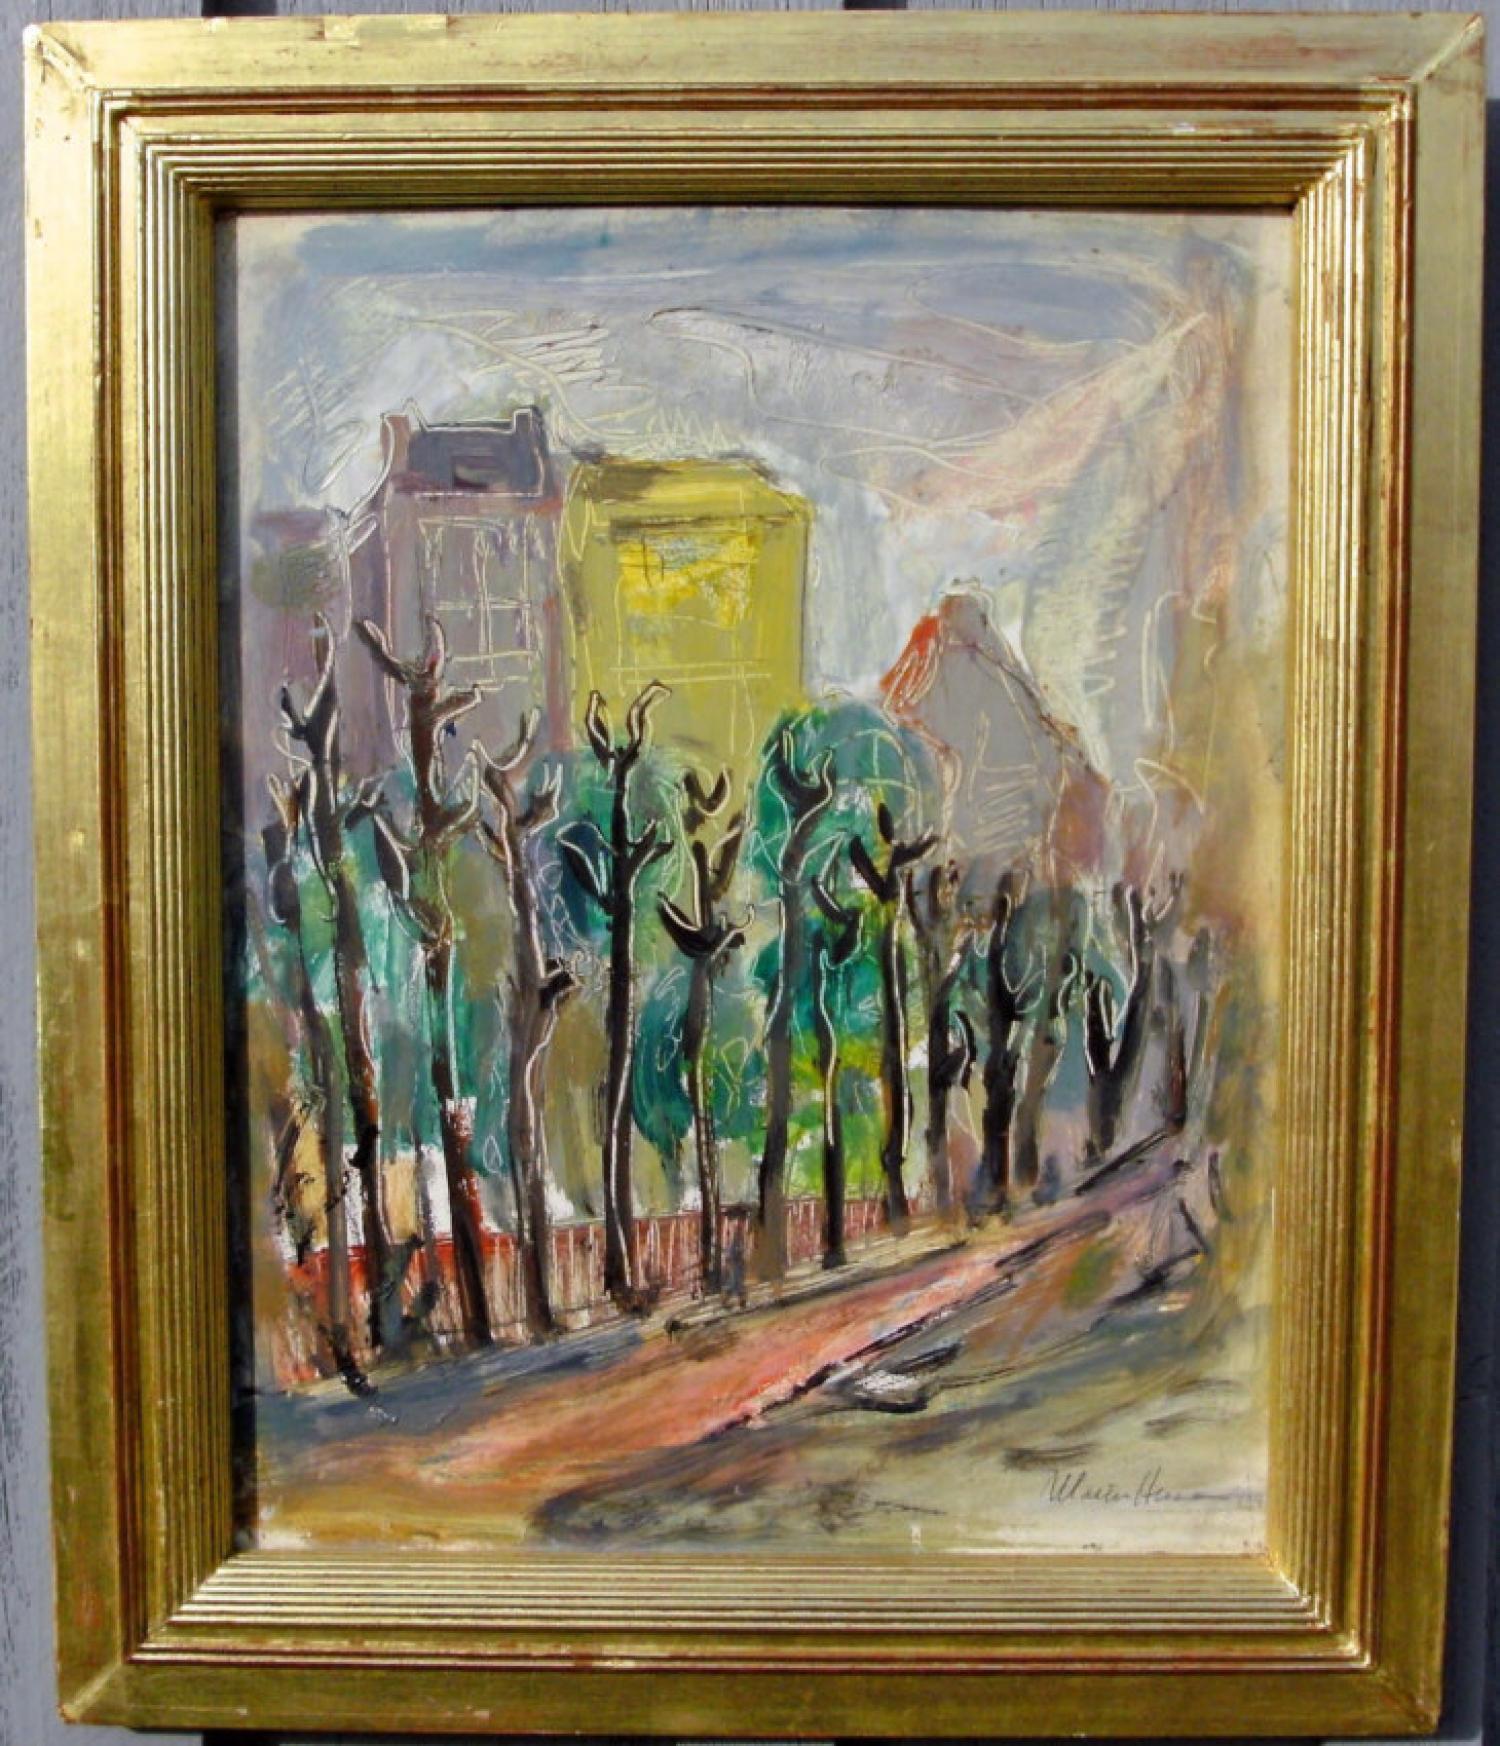 Marion Huse fauvist style oil painting on masonite